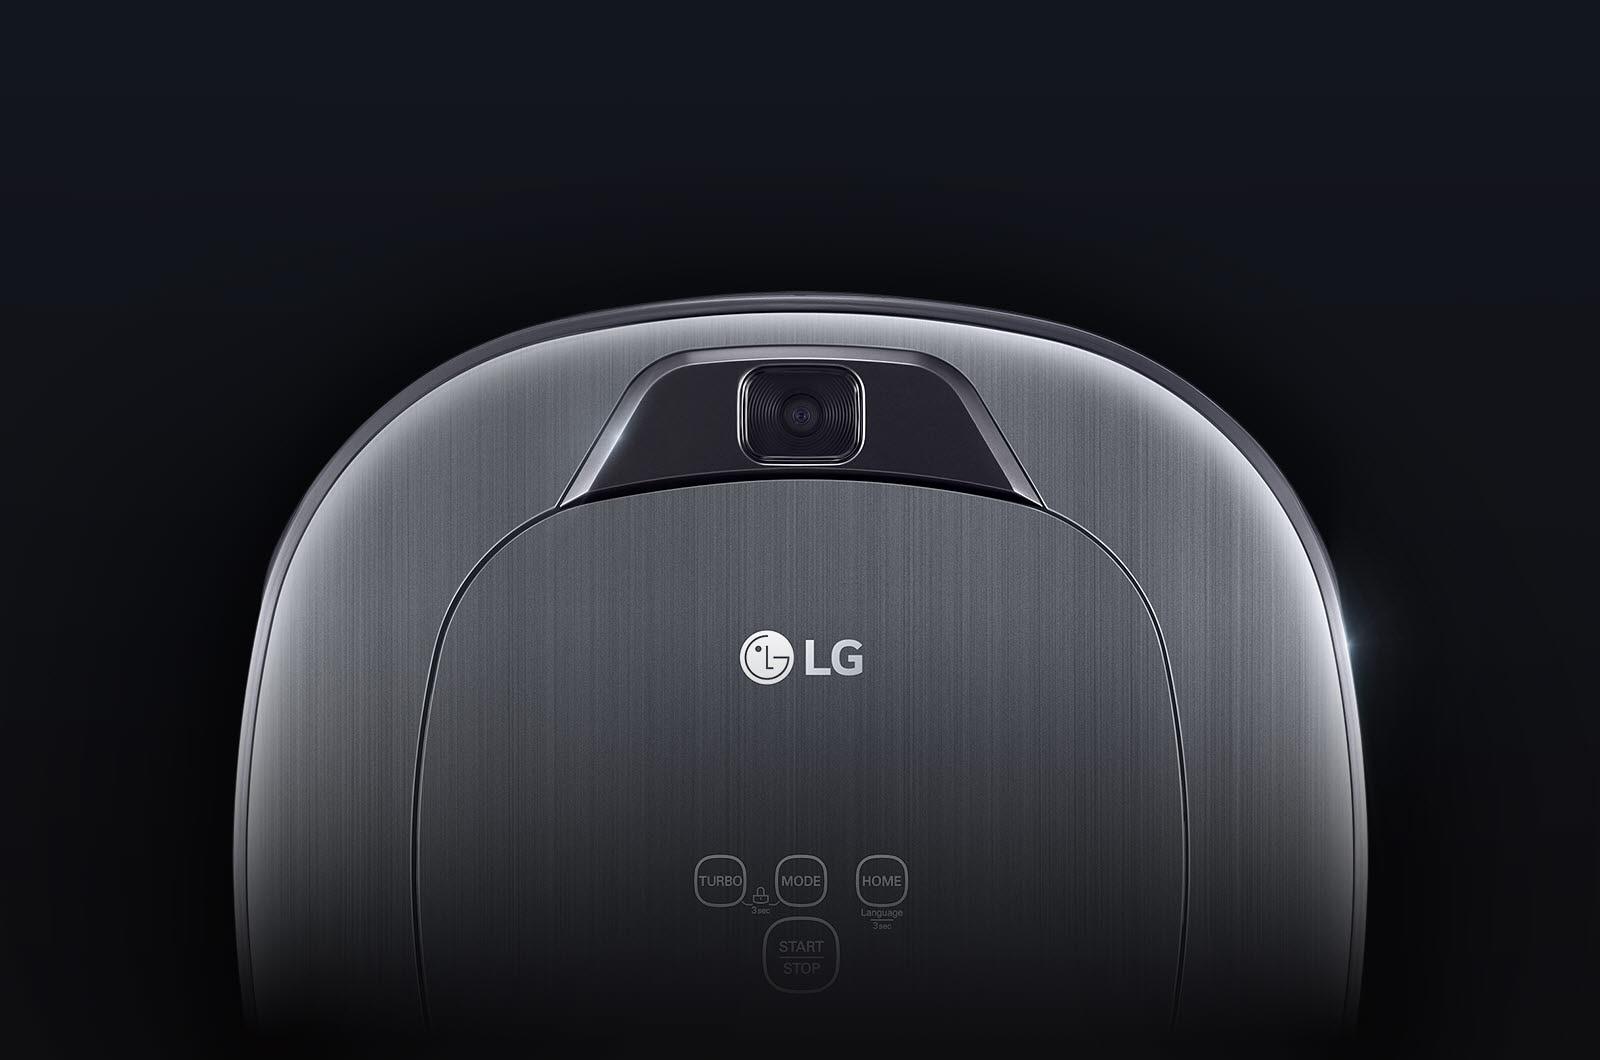 LG HOM-BOT™ Turbo+ Robotic Smart wi-fi Enabled Vacuum | LG